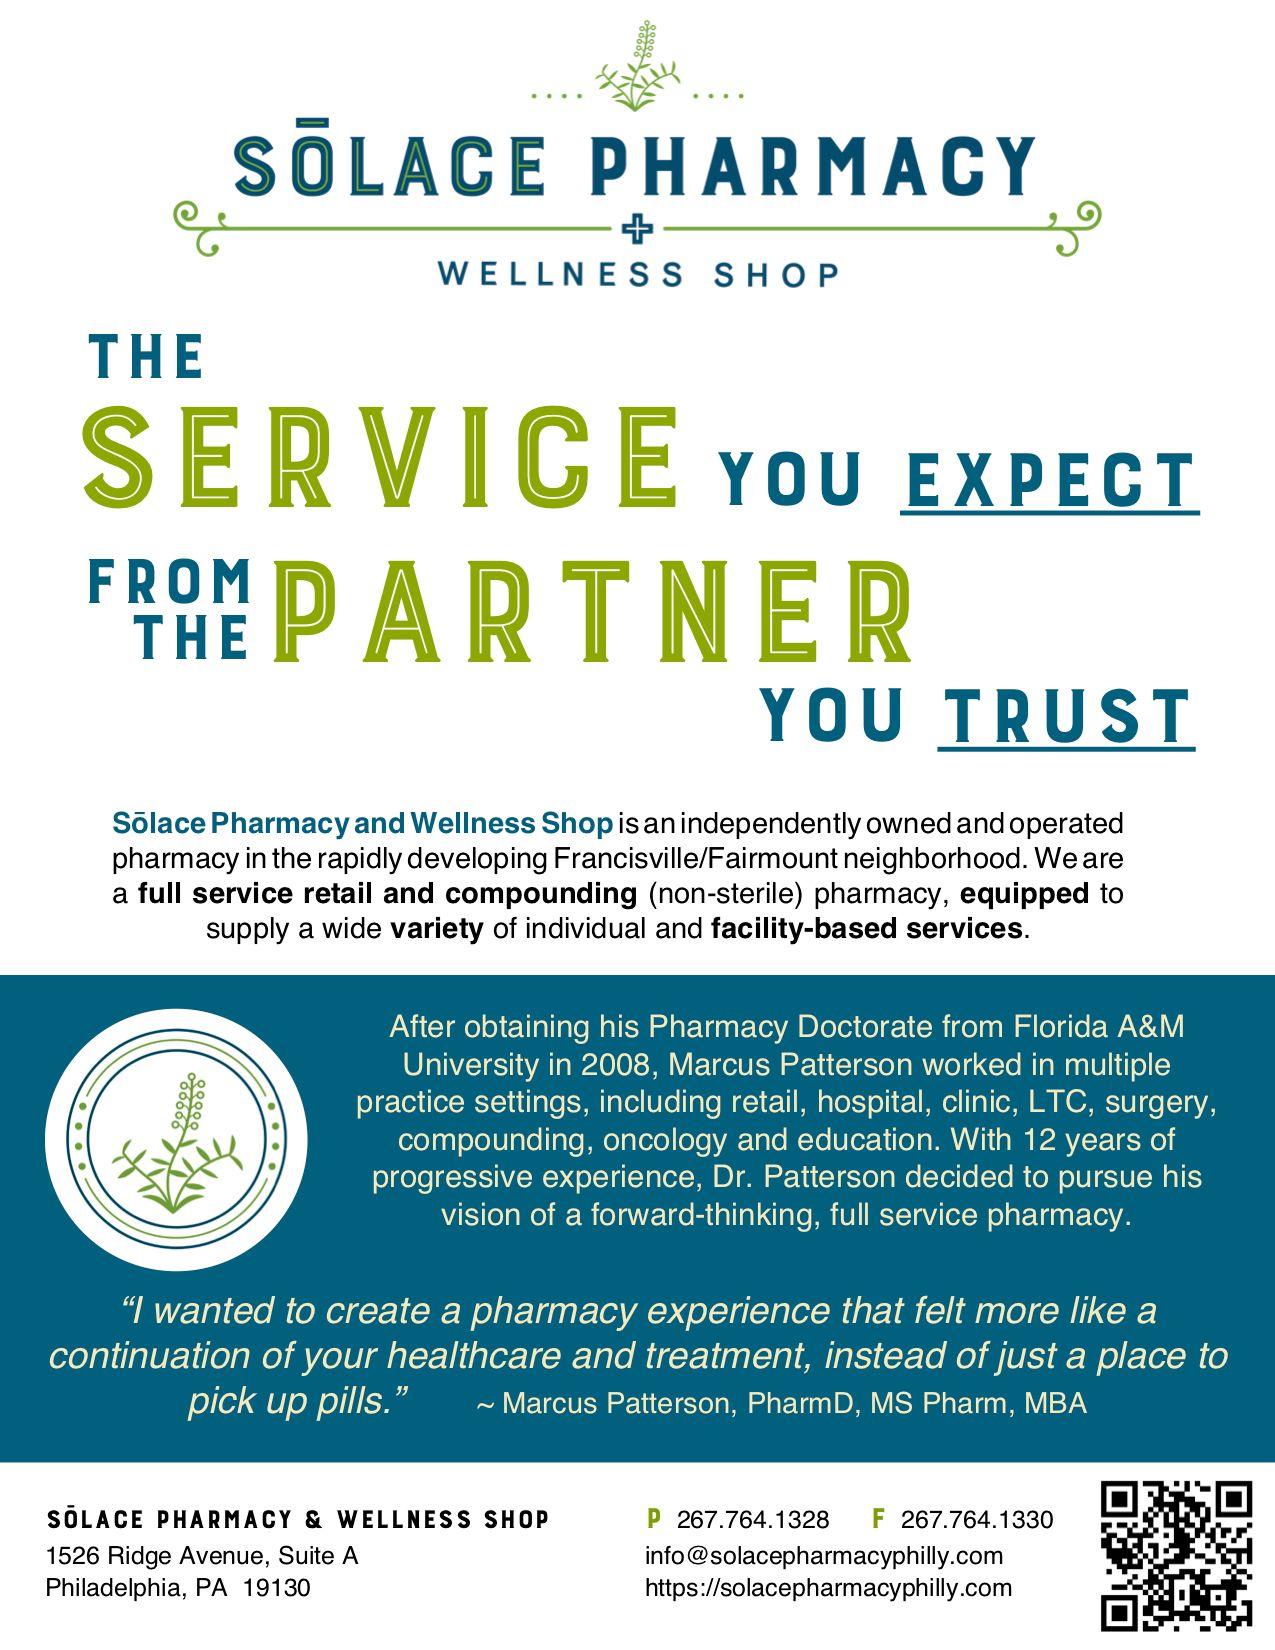 Solace_Pharmacy_ALFLTC_Services October 2020.jpg